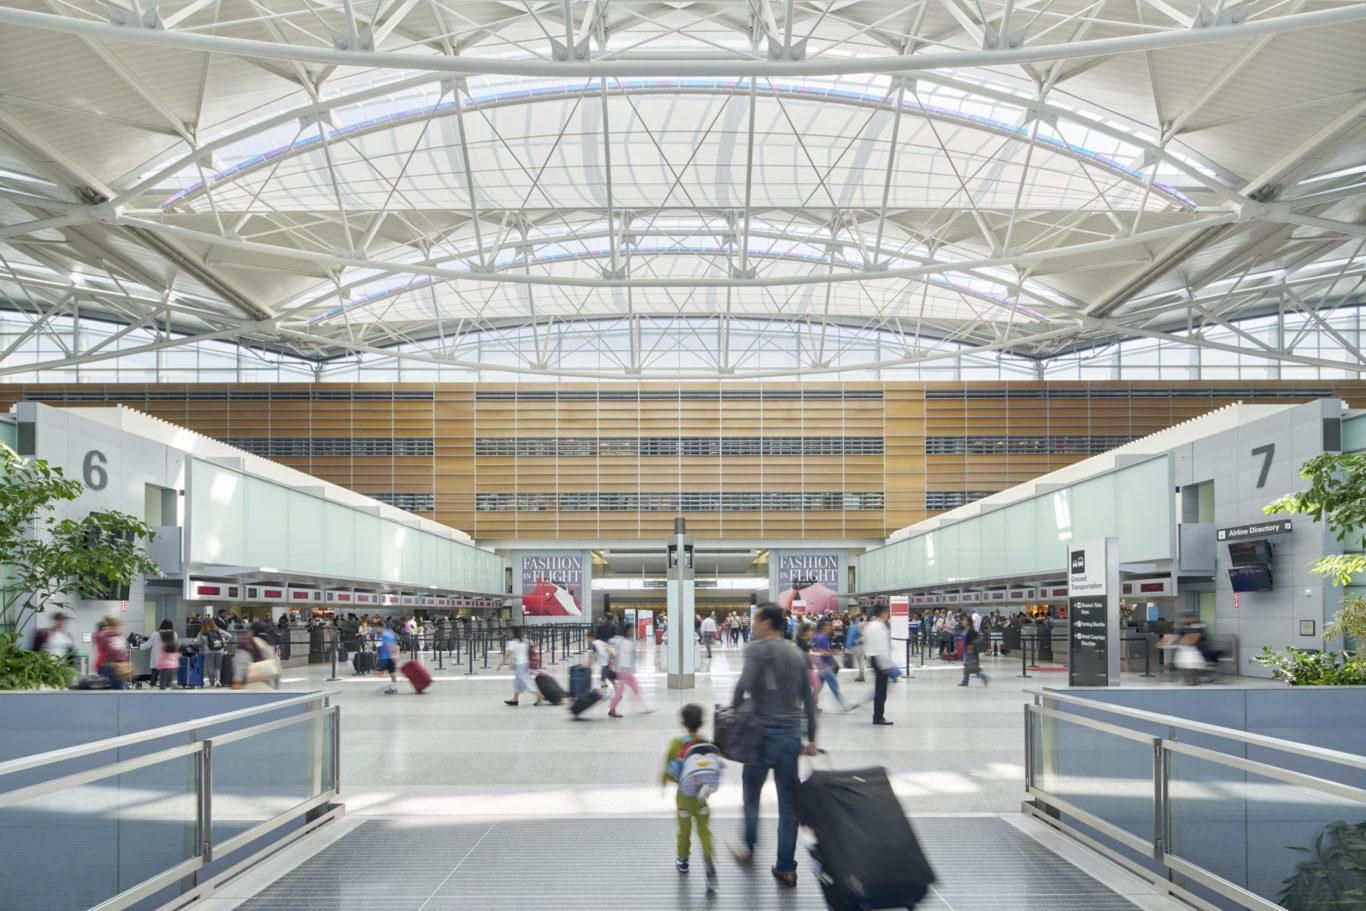 Slide 2 of 7, San Francisco International Airport – International Terminal